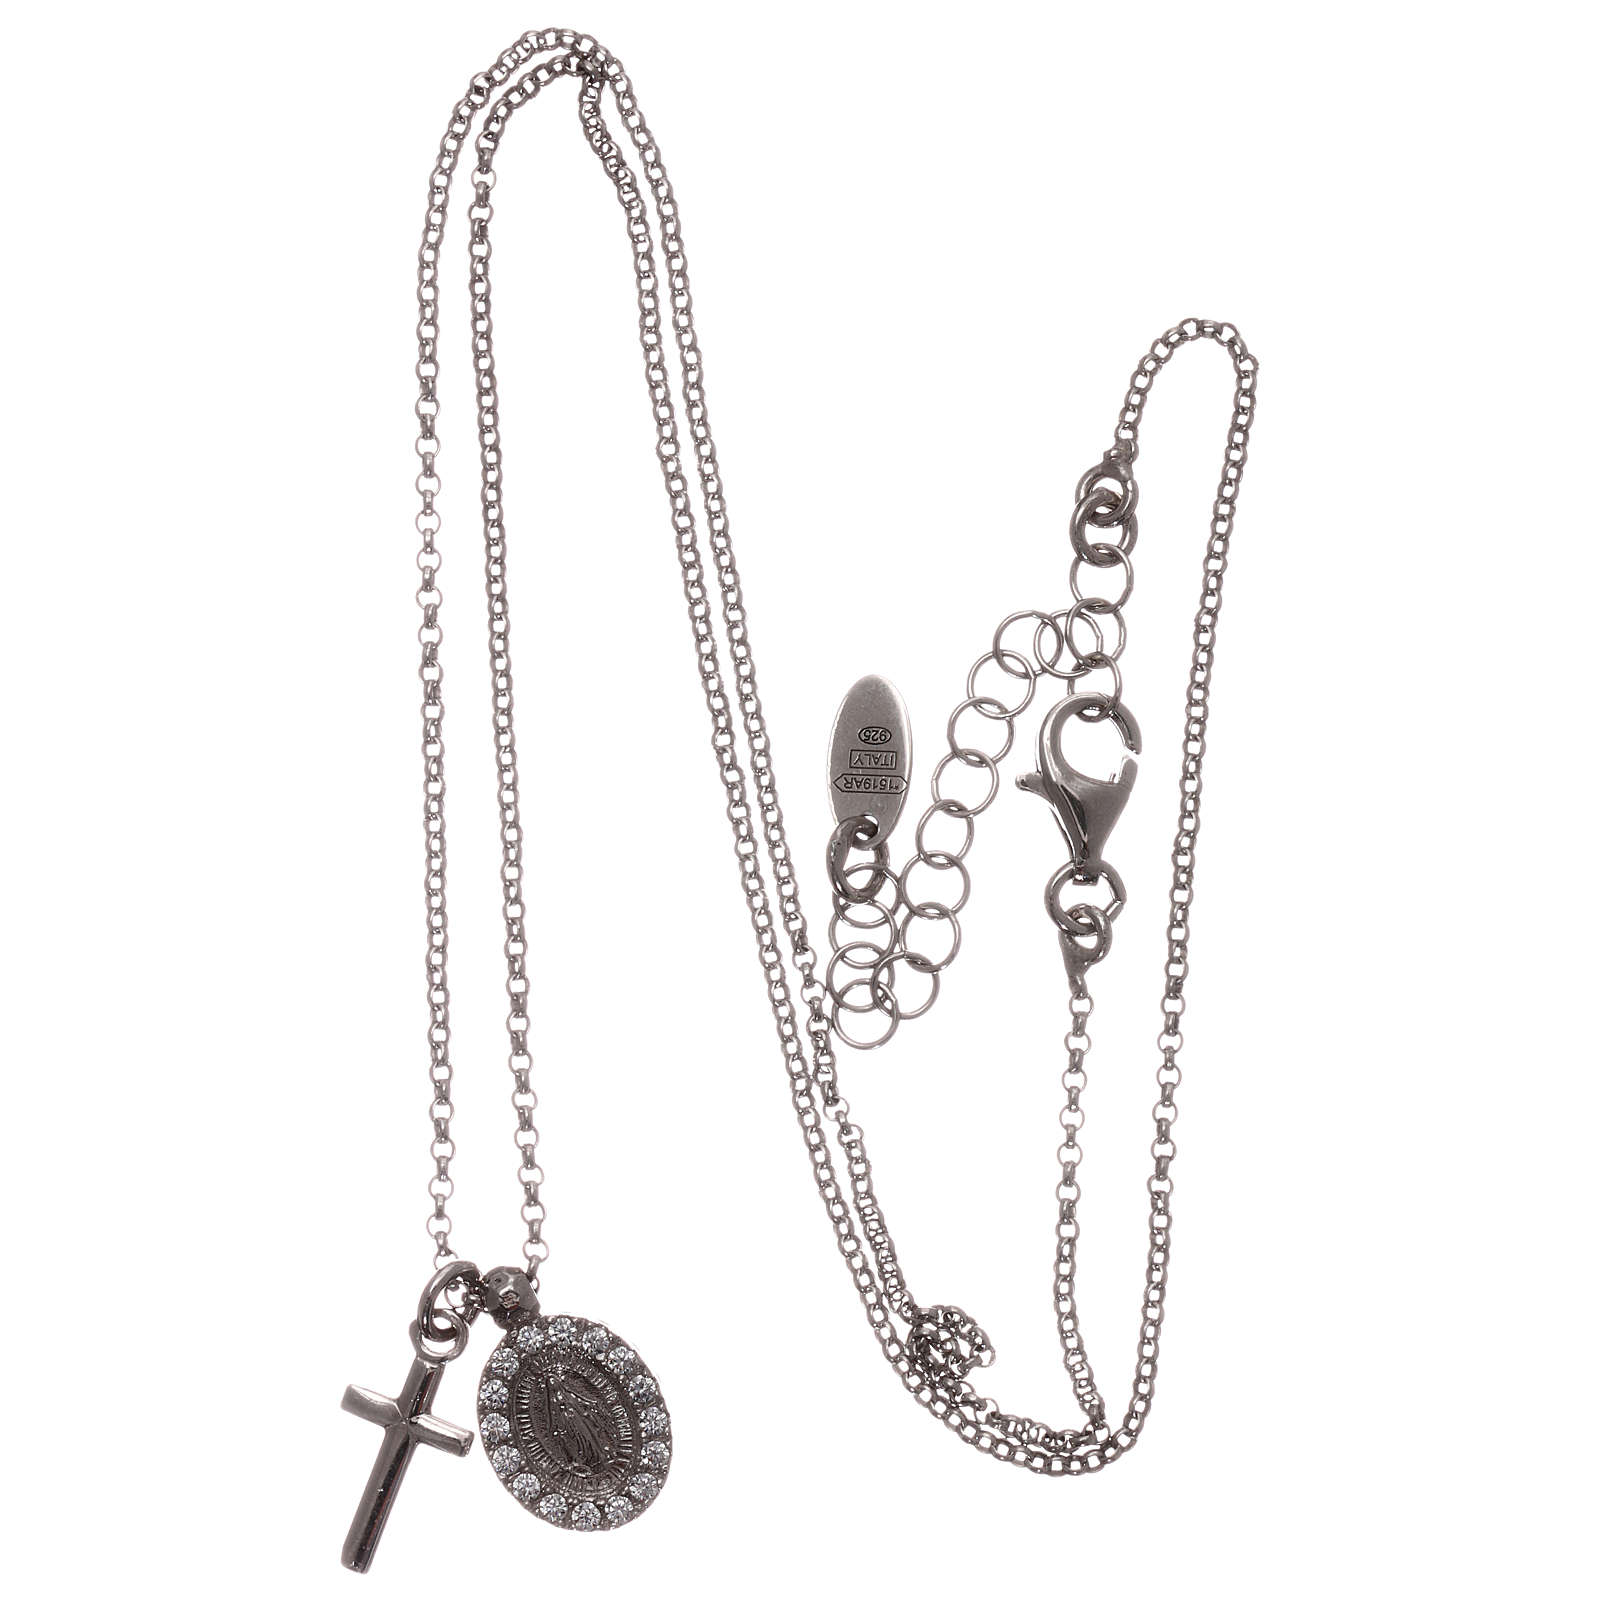 Collana AMEN arg 925 rodiato zirconi bianchi croce madonna miracolosa 4